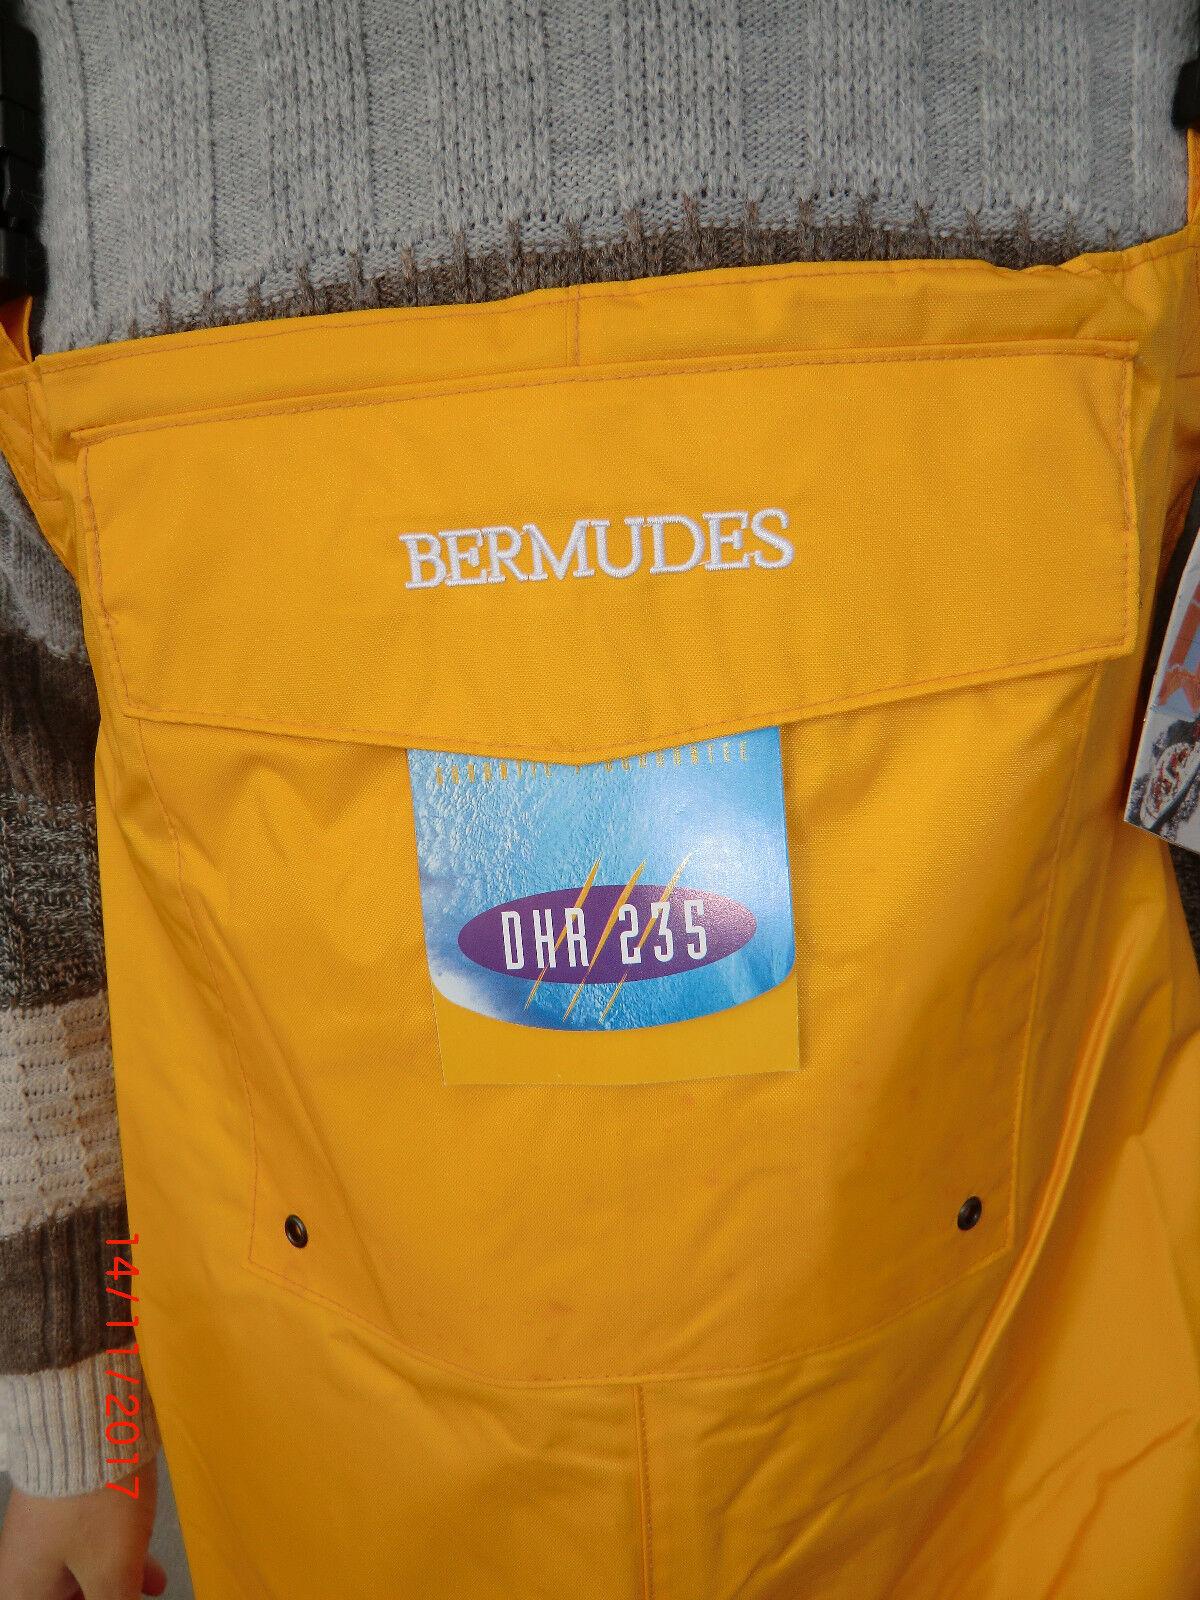 Bermudes Ölzeug Ölzeug Bermudes Hose Regenhose Segelhose Gelb 1a0540